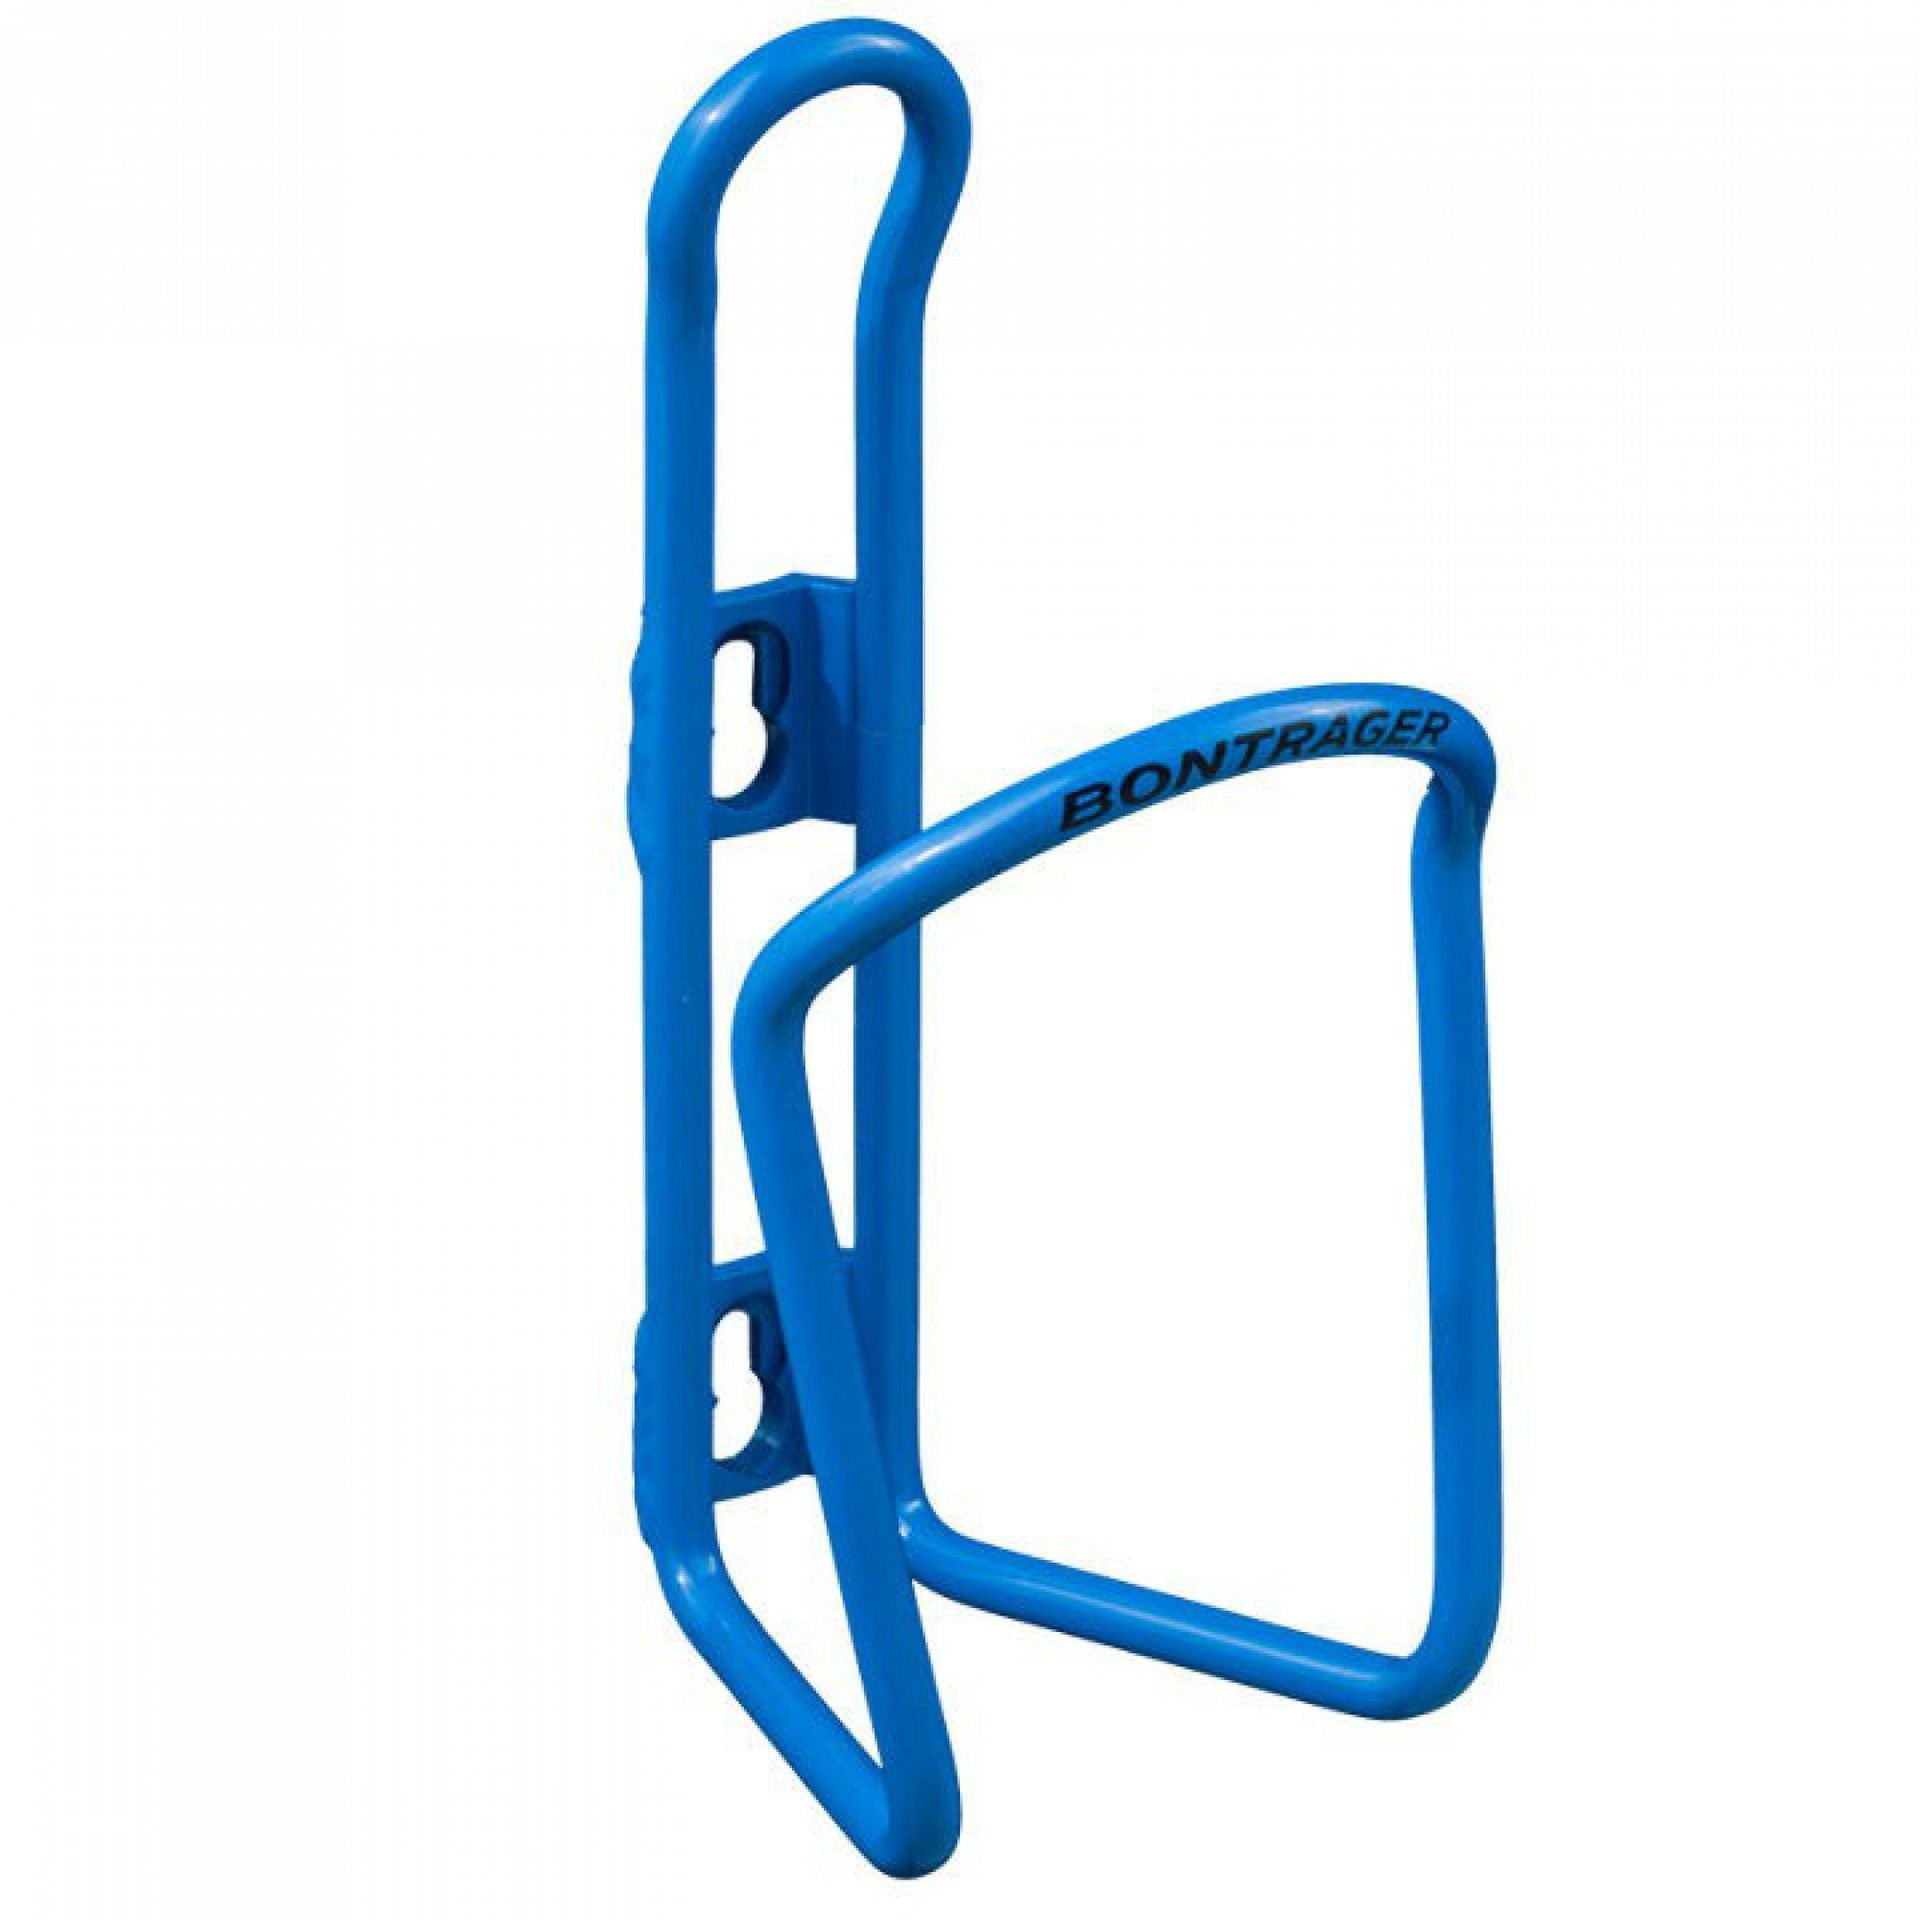 KOSZYK NA BIDON ROWEROWY BONTRAGER HOLLOW 6MM BLUE